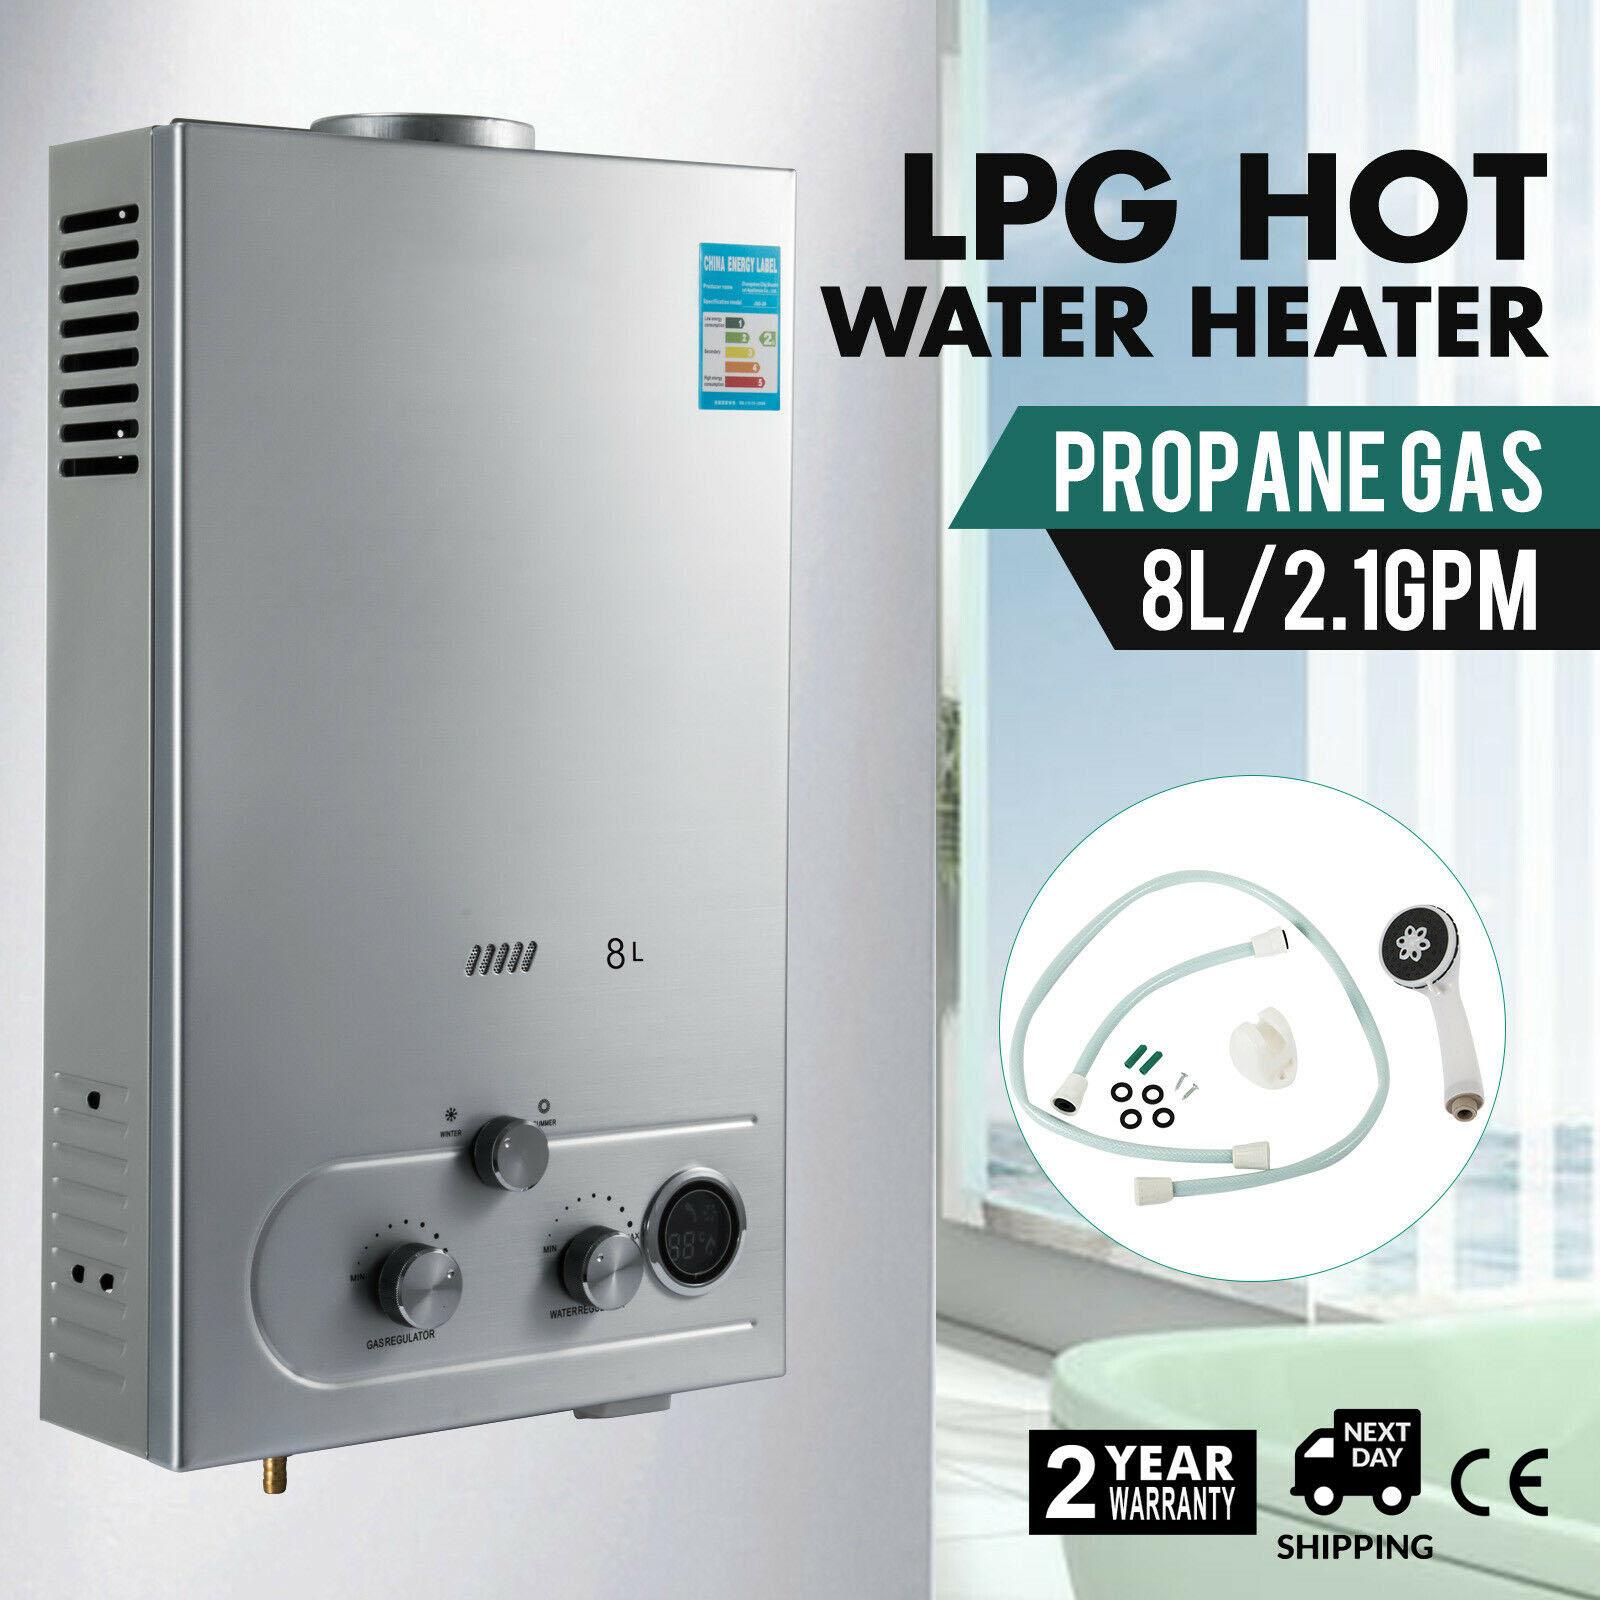 VEVOR Hot Water Heater Propane Gas LPG 8L On-Demand Tankless Water Heater Digital